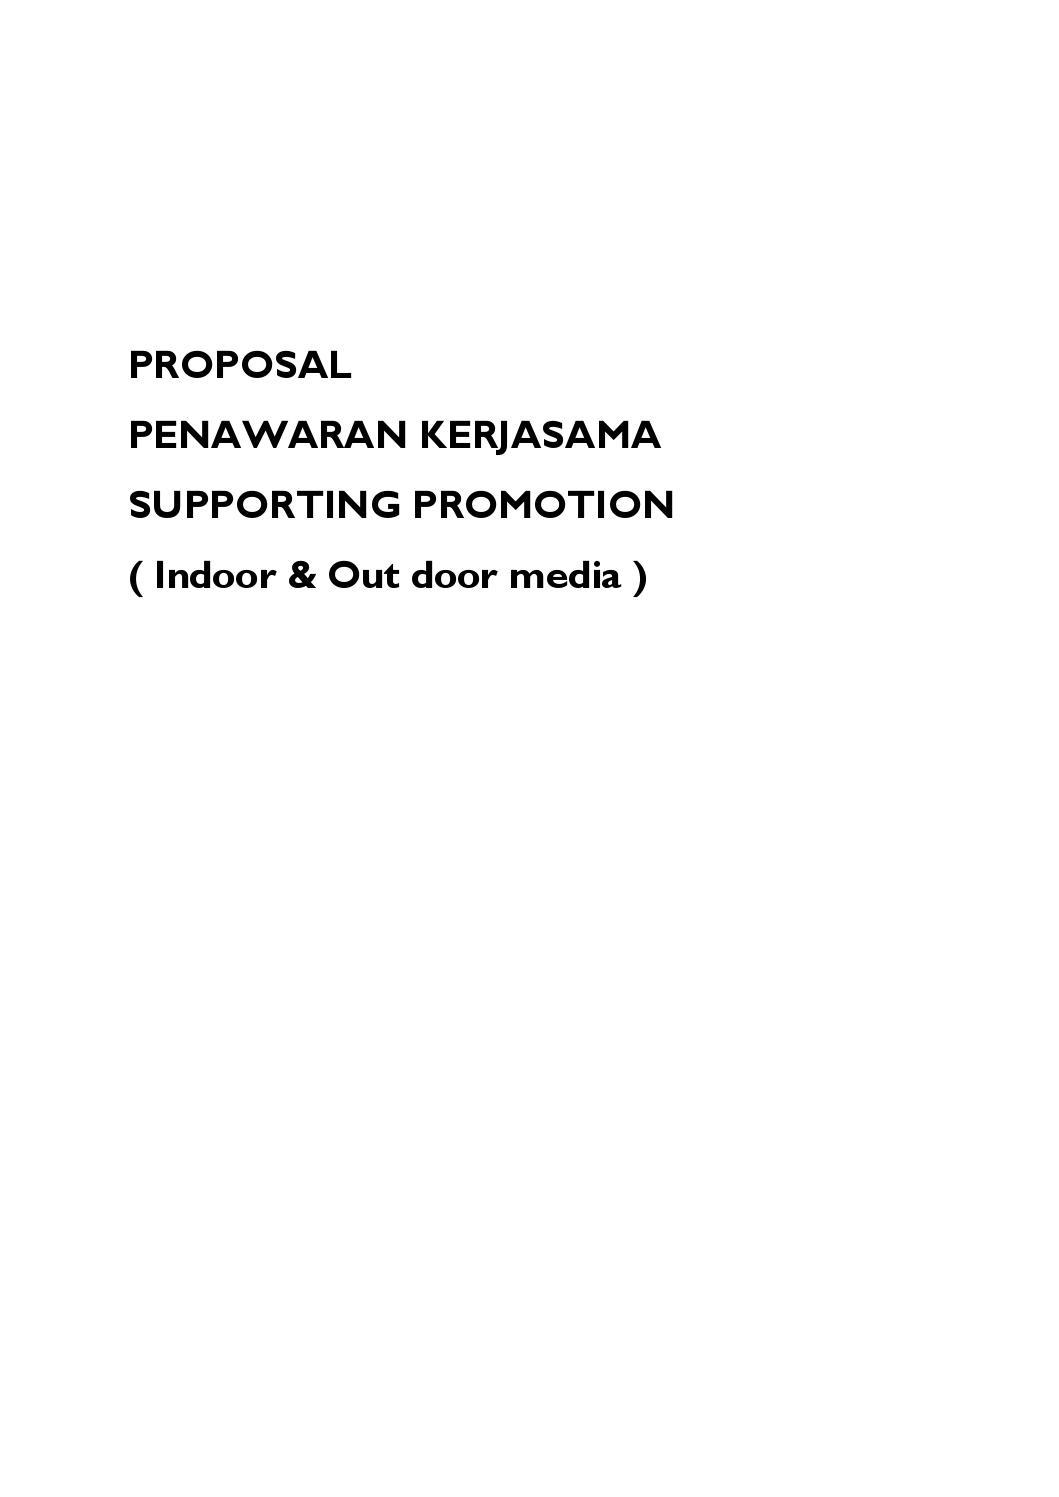 Proposal Penawaran Kerjasama By Melisa Bathia Issuu